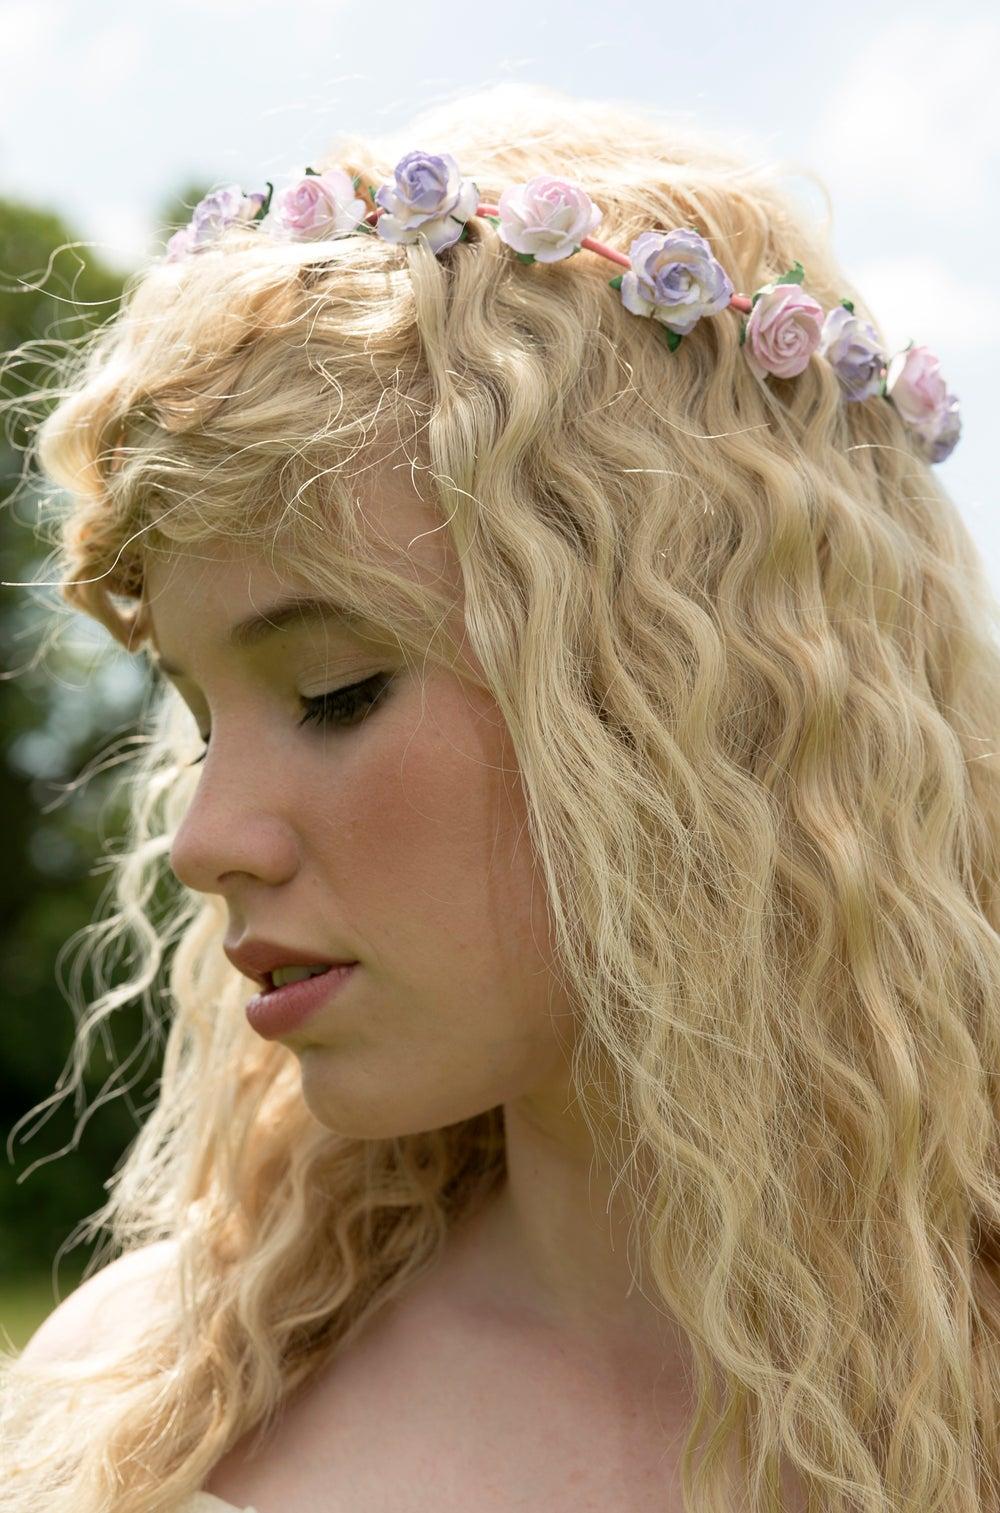 Image of Freya Garland